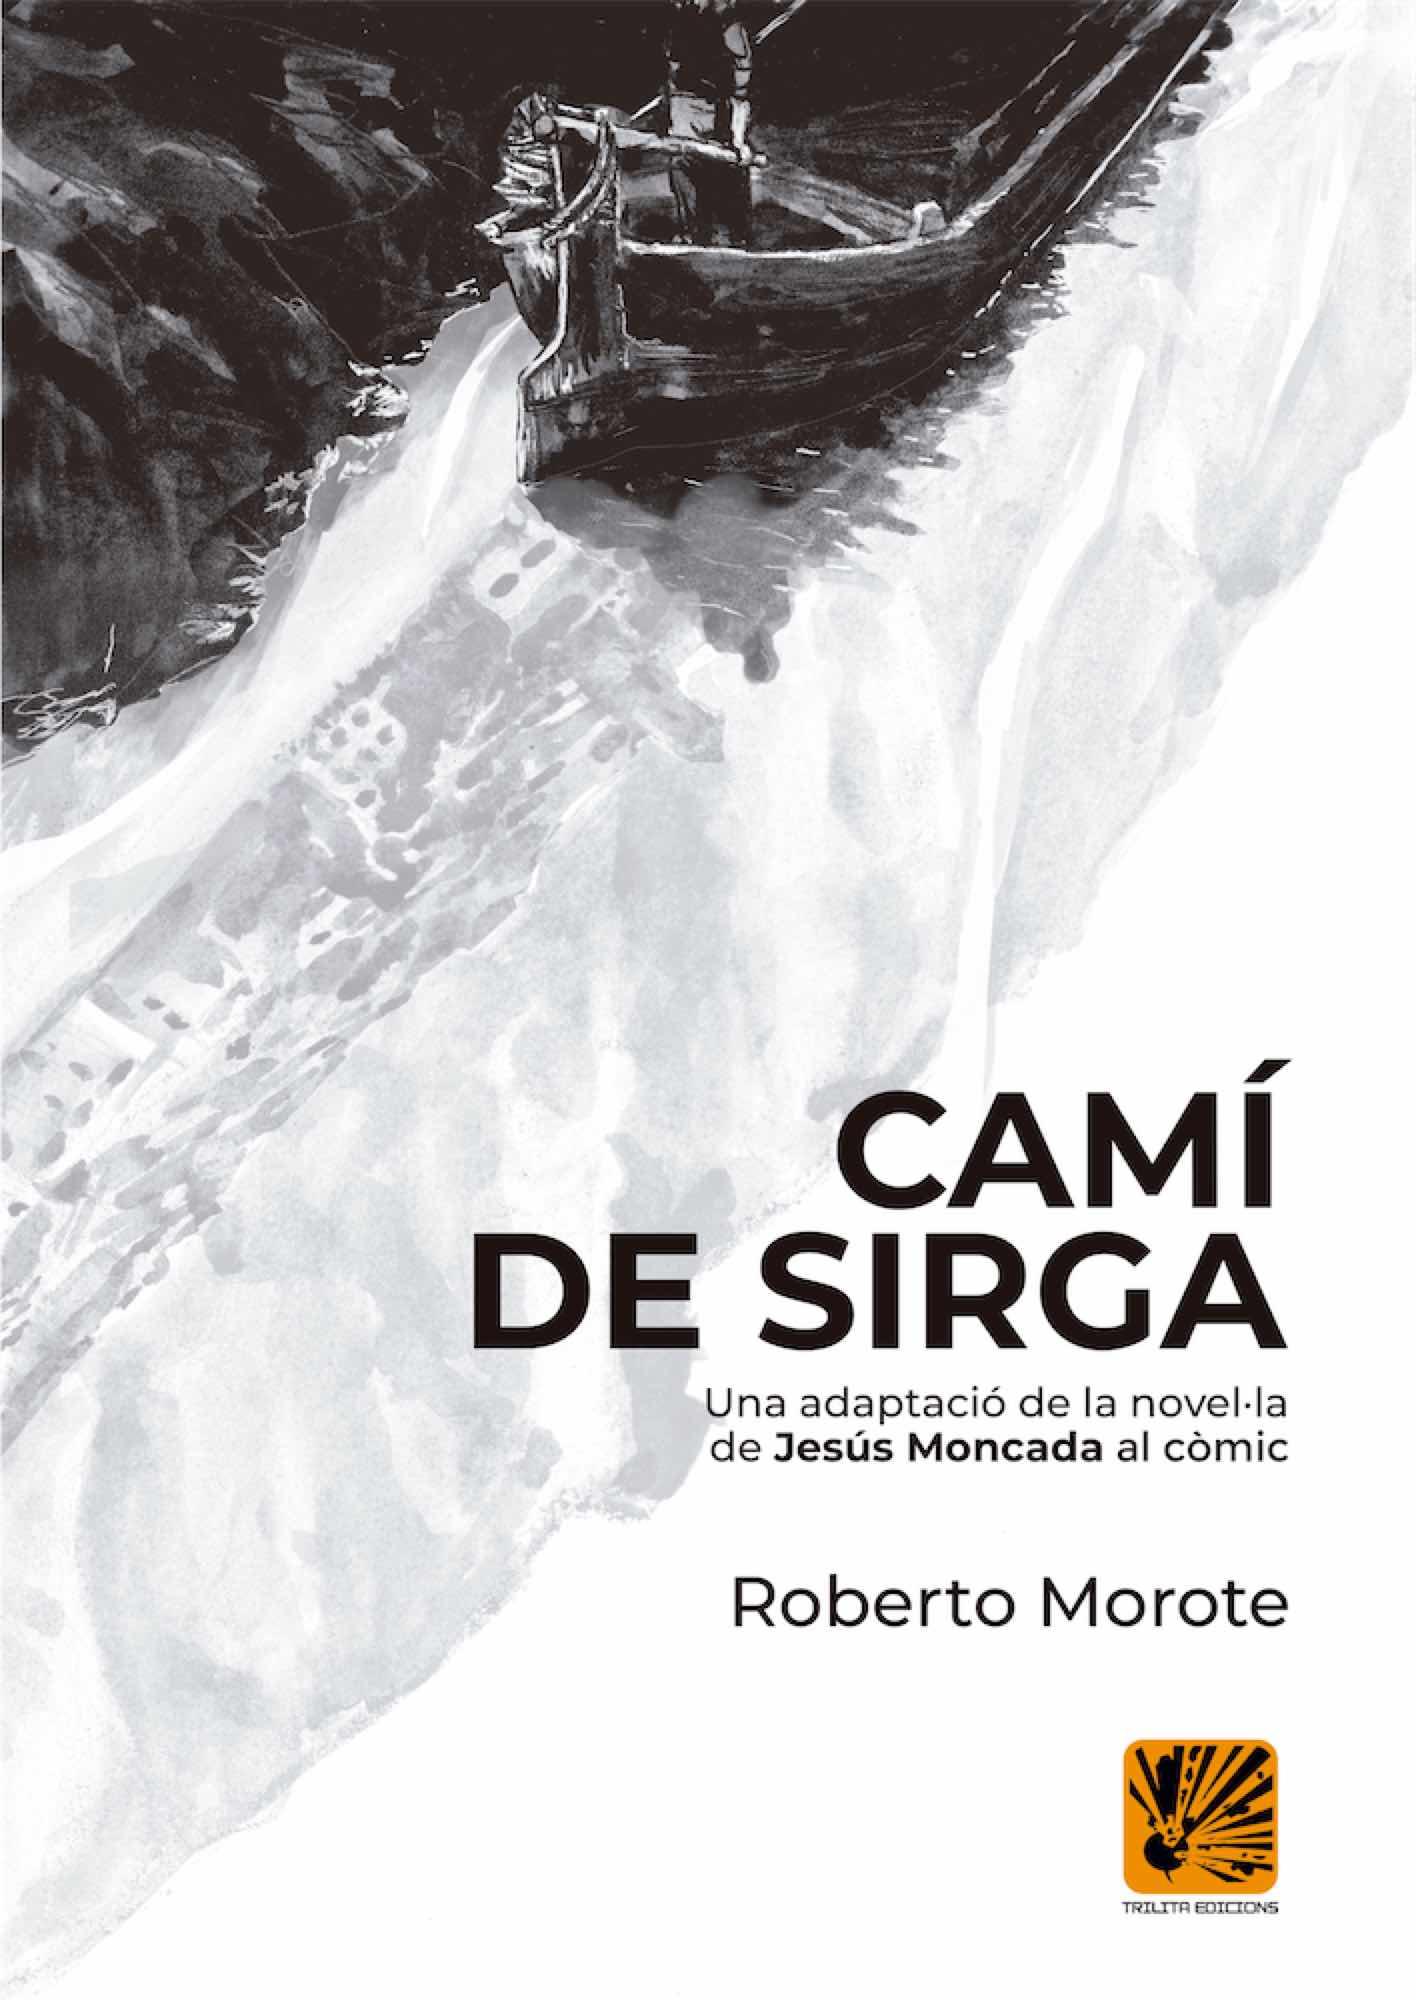 CAMÍ DE SIRGA (CATALAN)